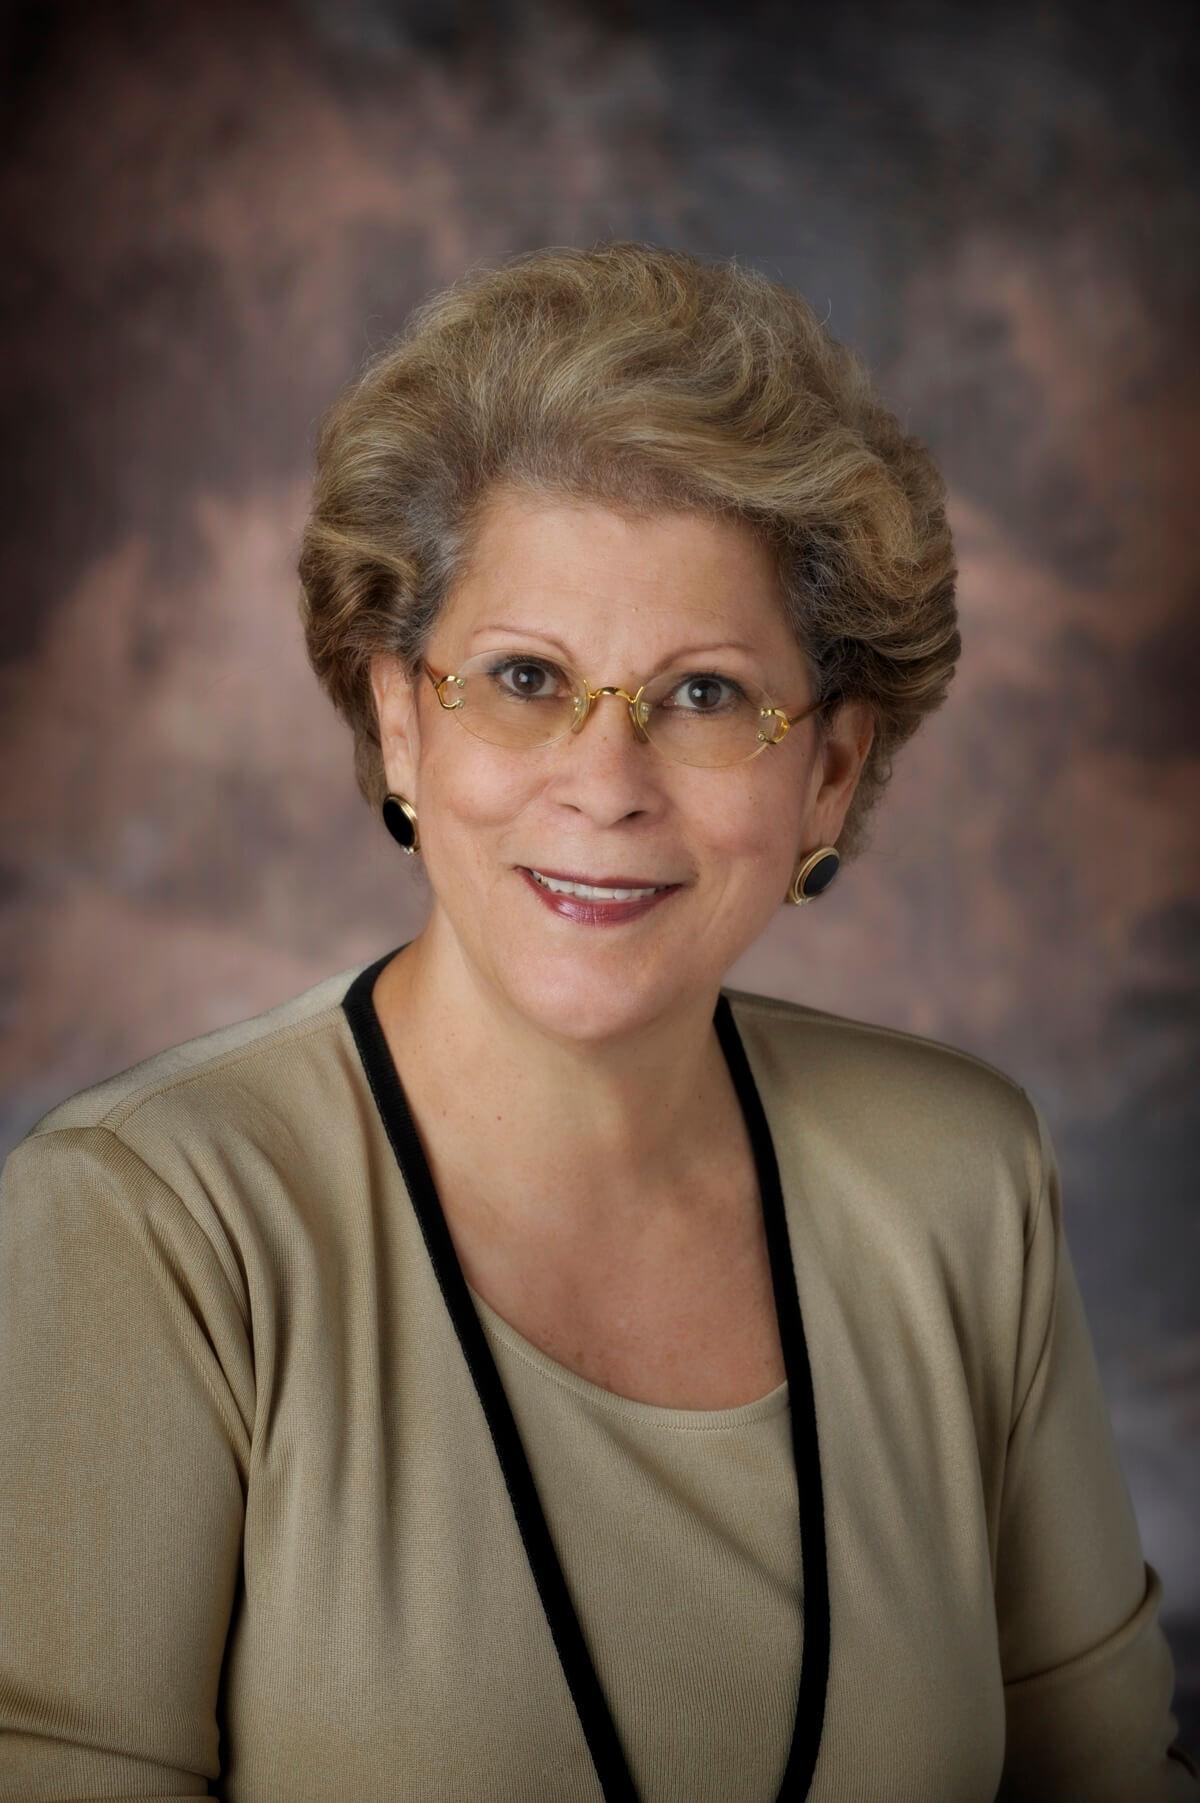 Dr.-Antonia-Novello